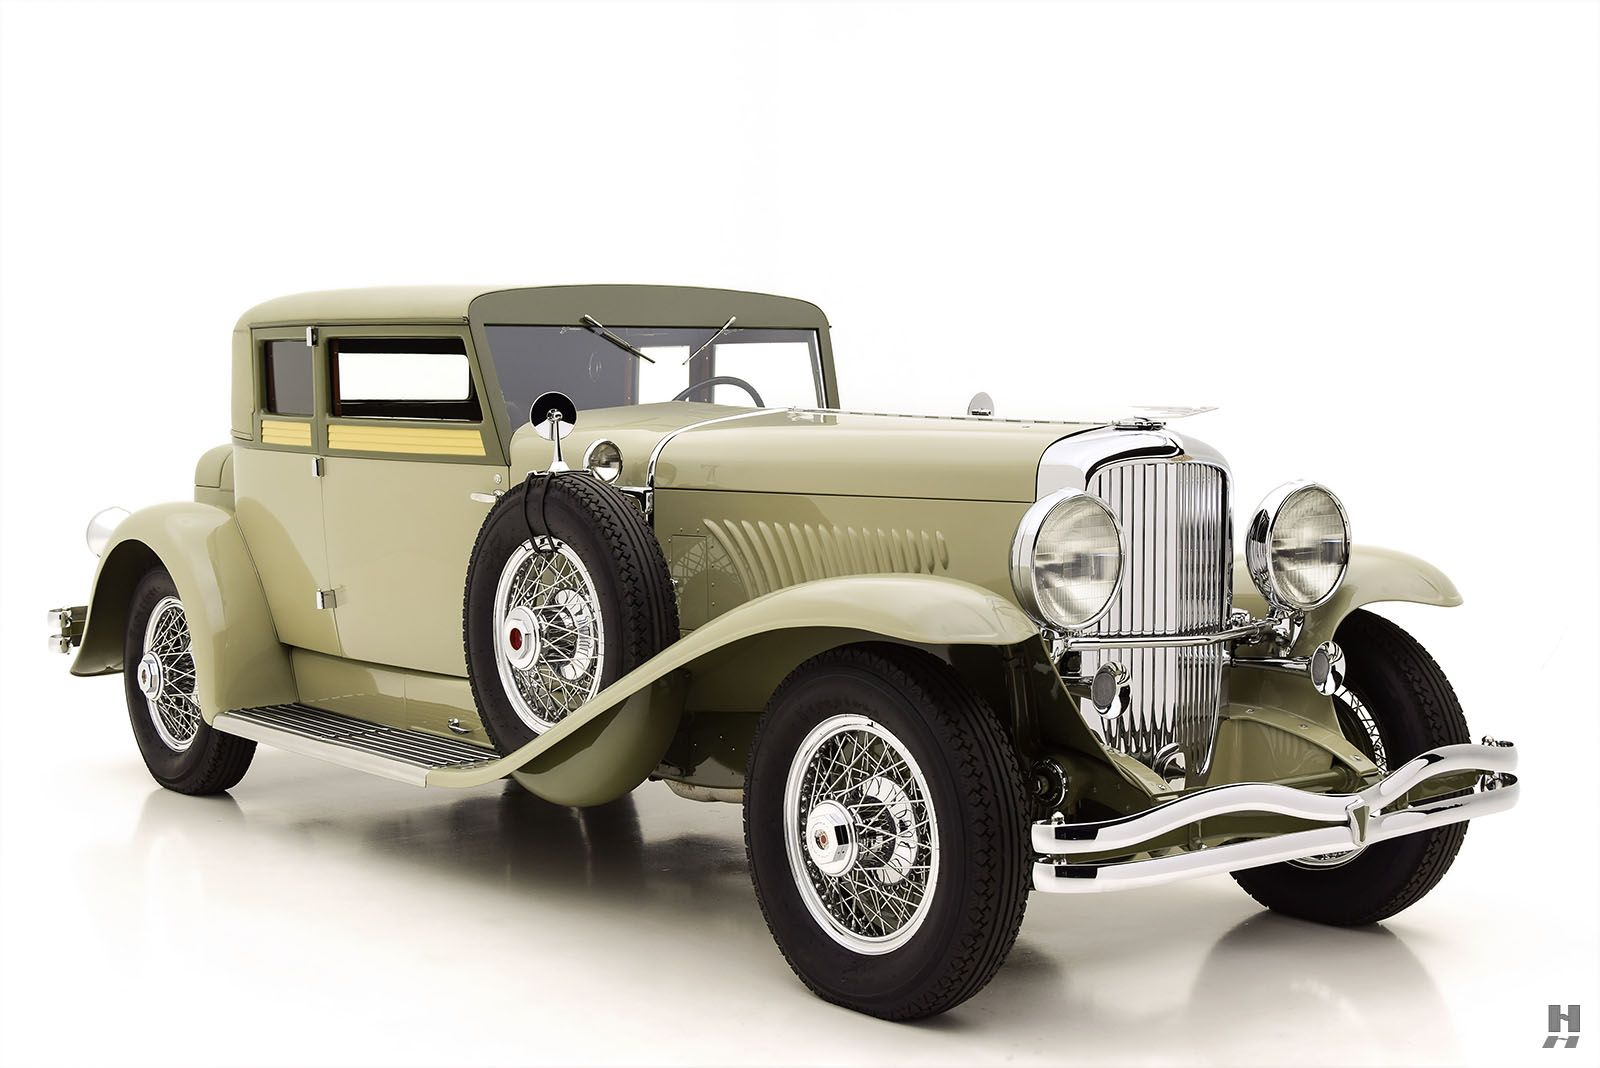 1932 Duesenberg Model J Judkins Victoria Coupe Vintage Cars